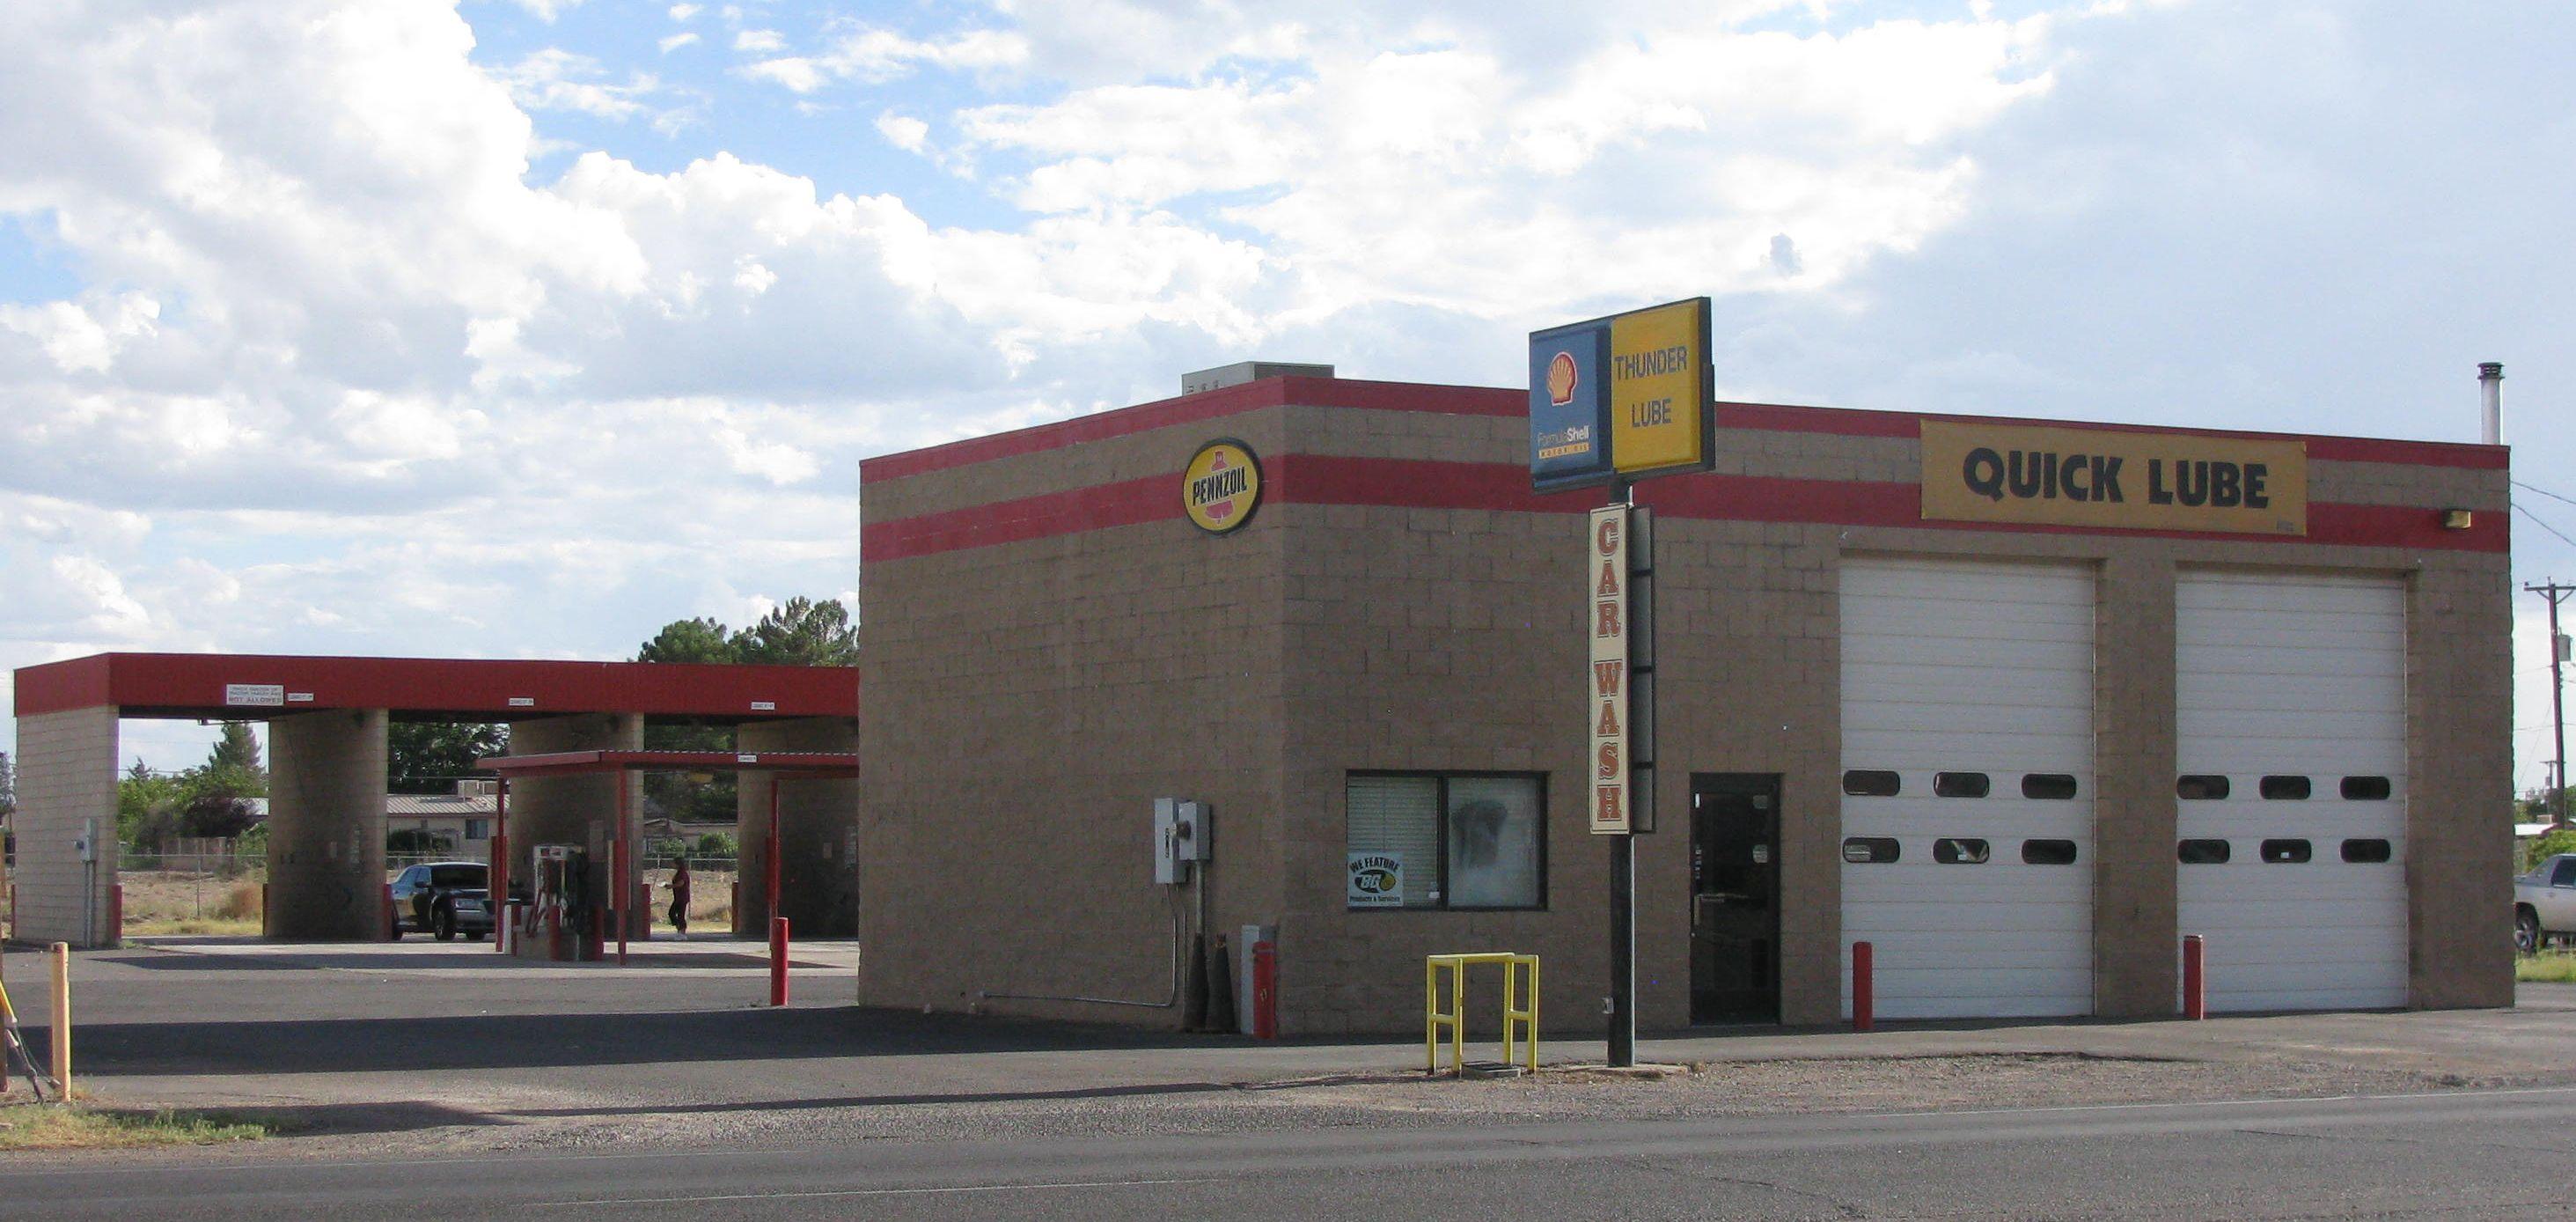 Car Wash Business For Sale El Paso Tx